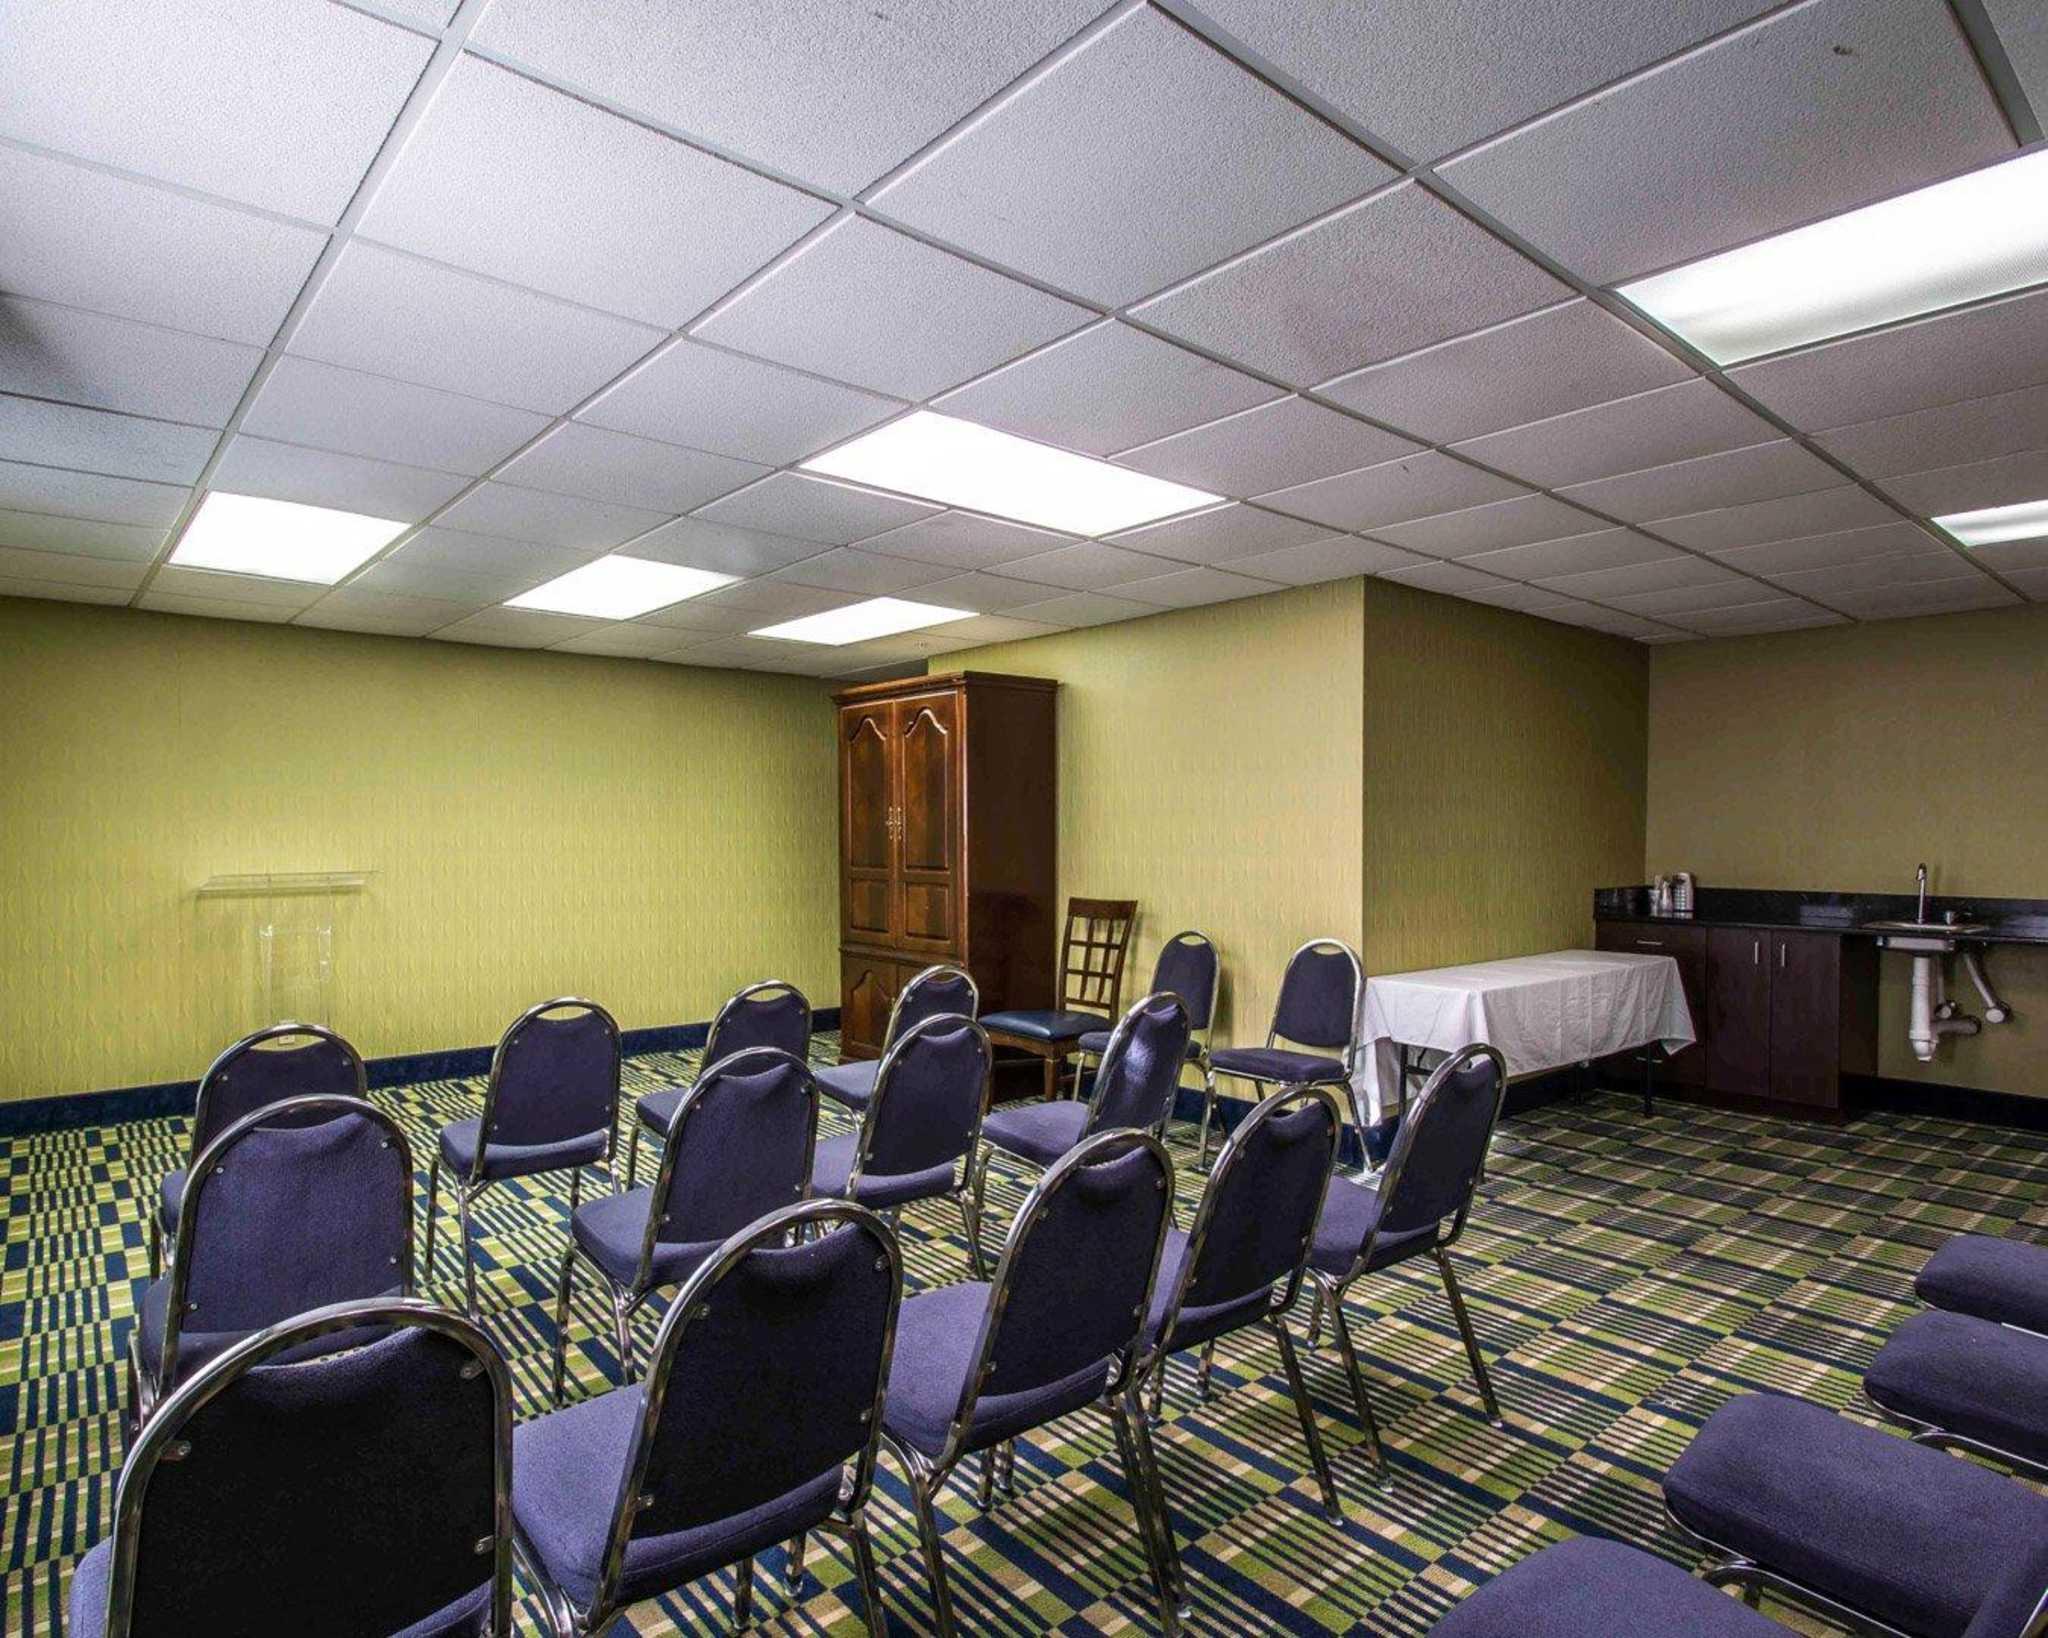 Comfort Inn & Suites Lantana - West Palm Beach South image 14